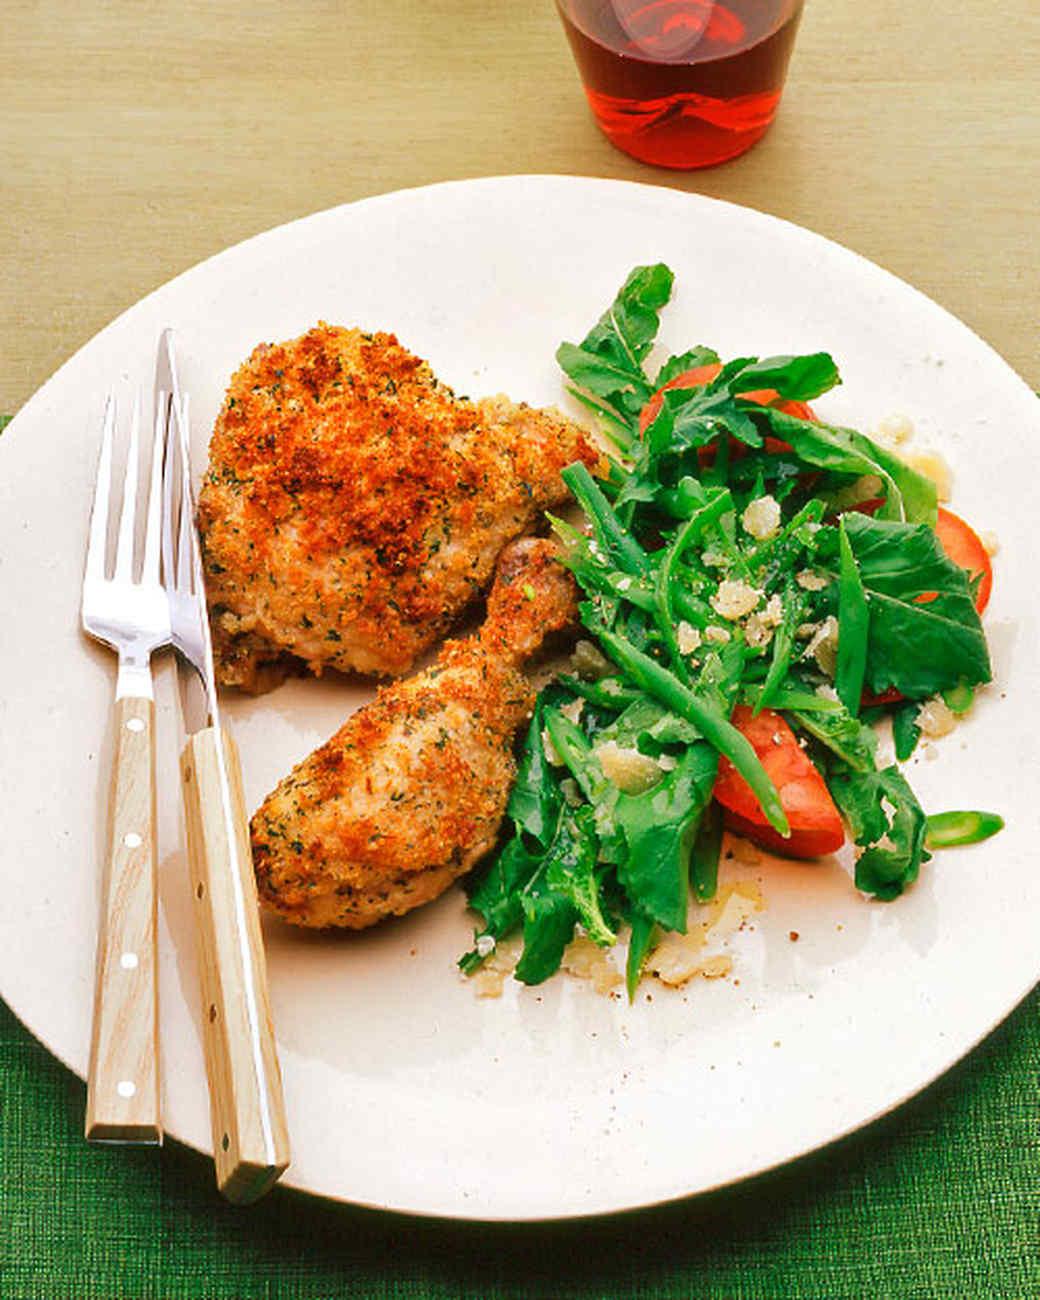 d_mh_1088_chicken_salad.jpg